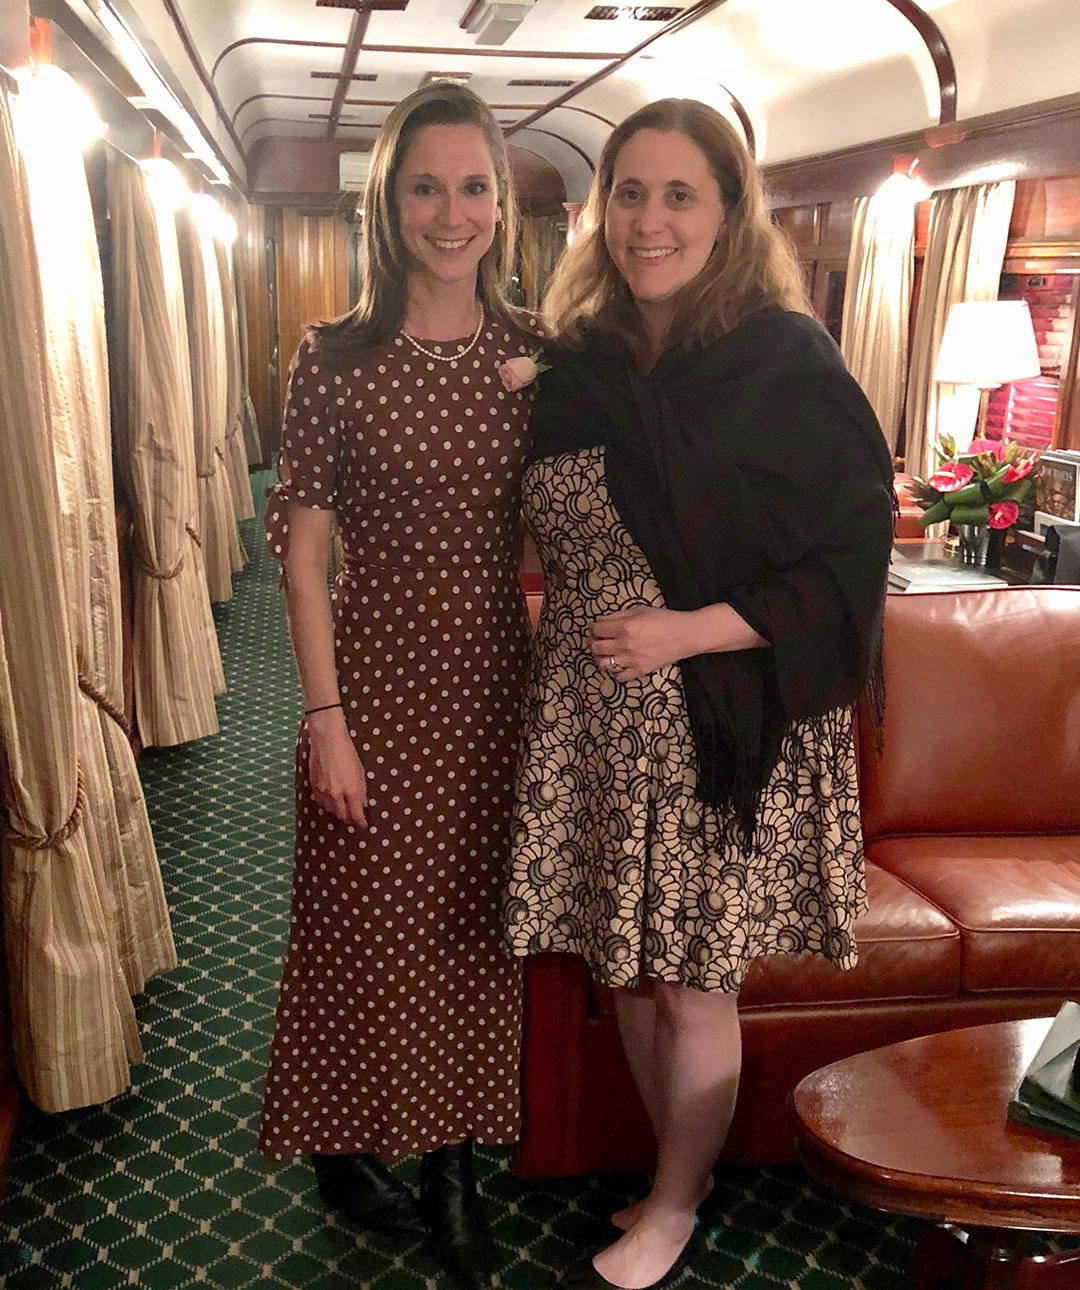 aa - Fancy Rachel and Angela edited small